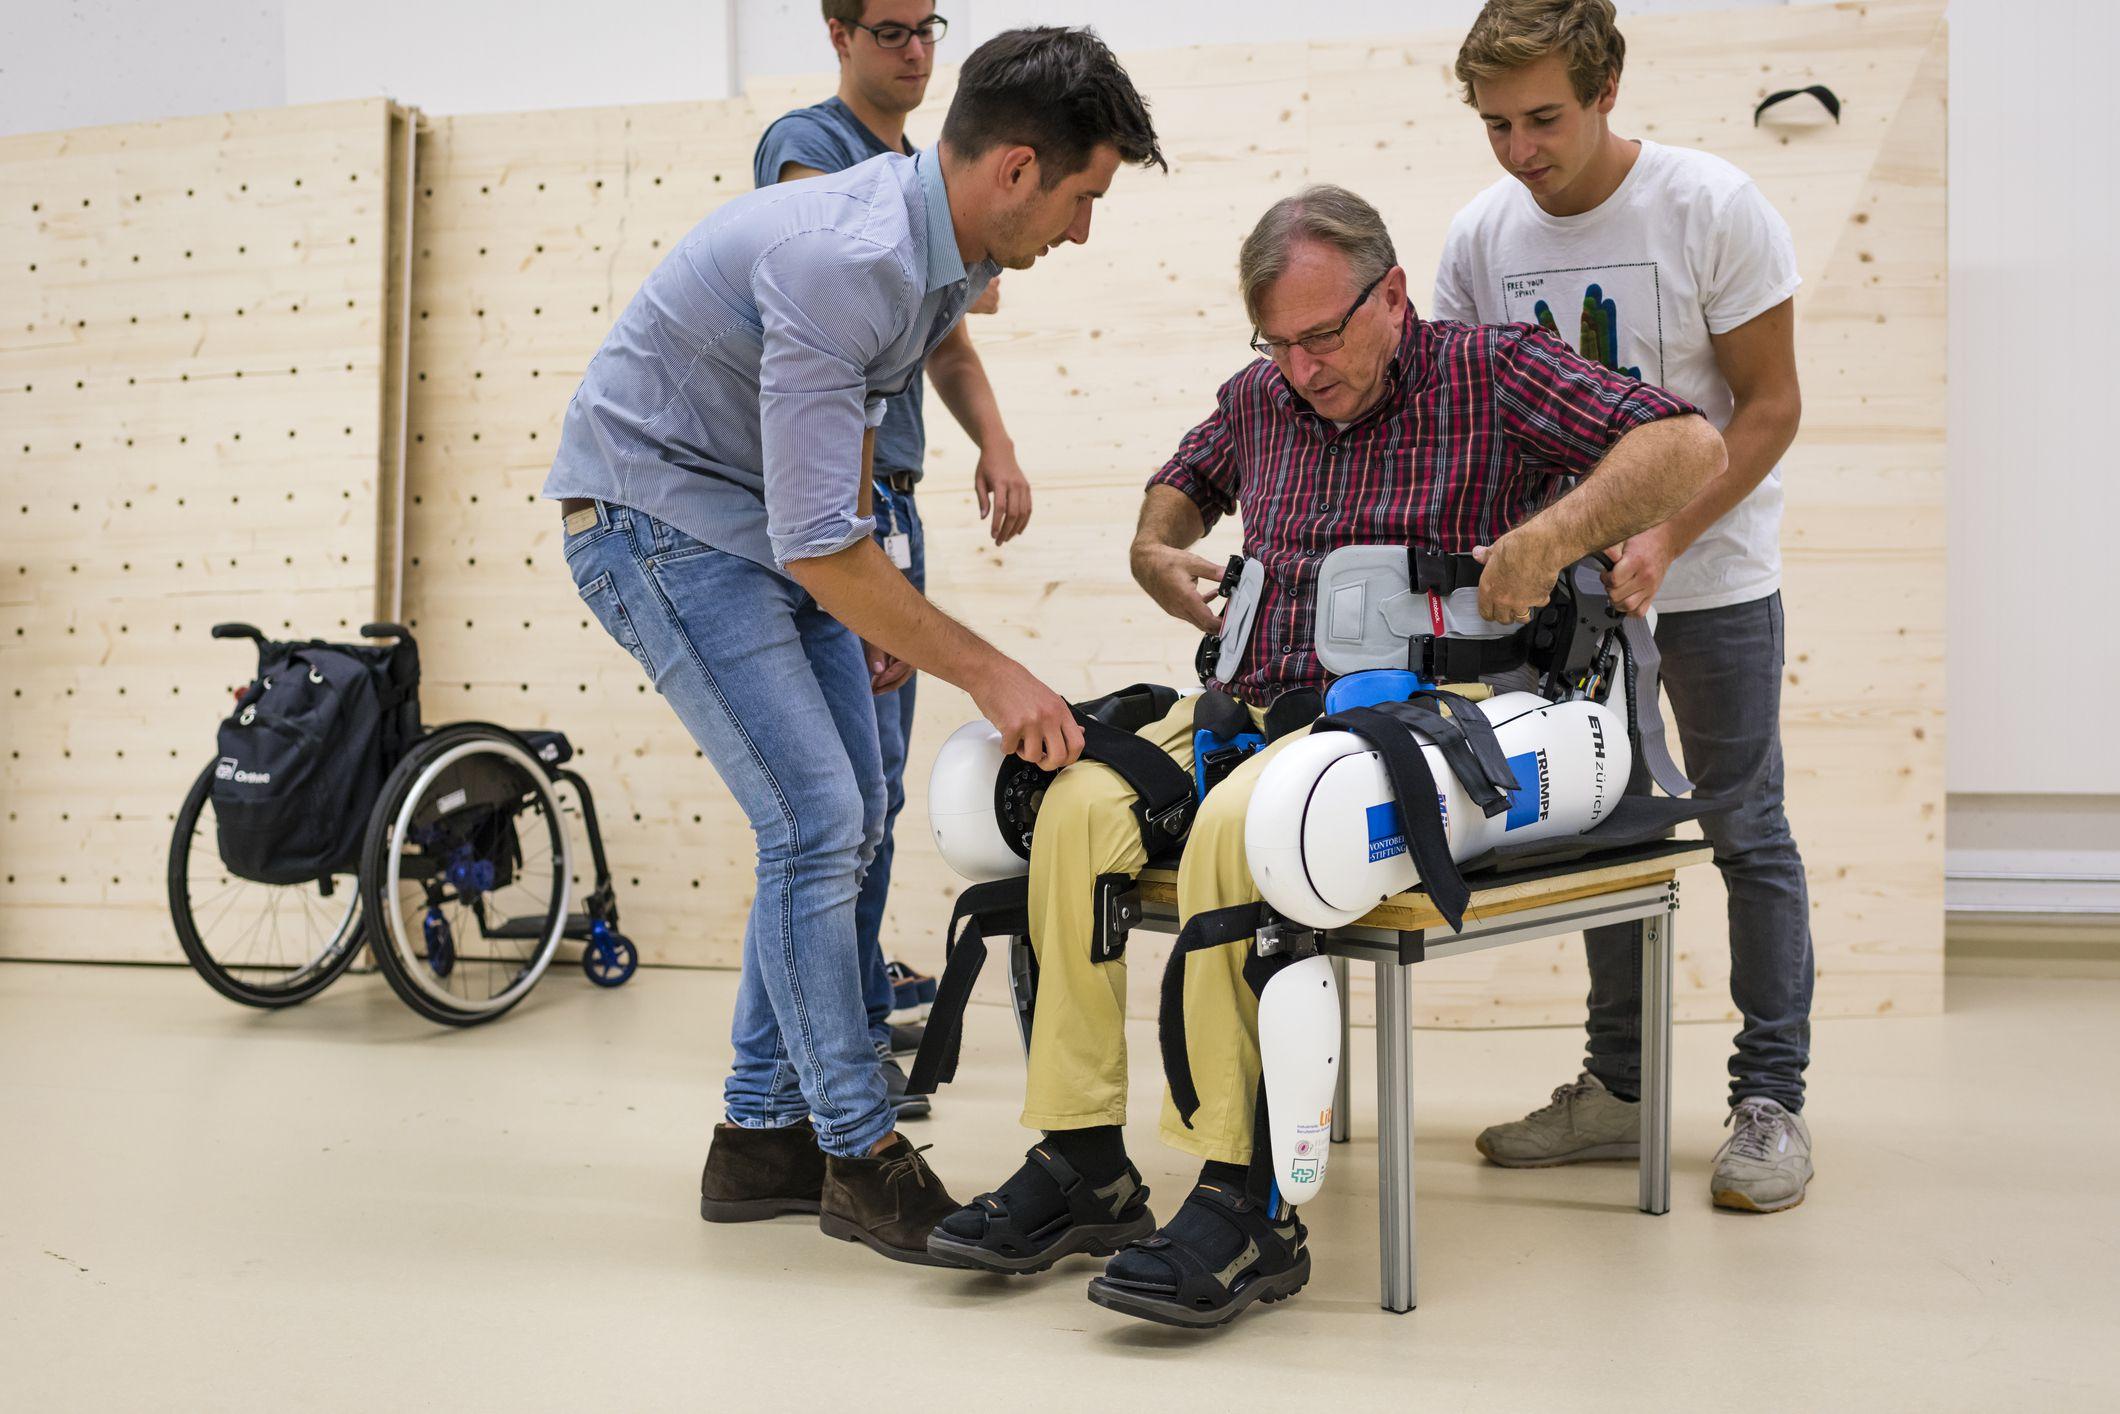 Radicava: A New Treatment Option for ALS